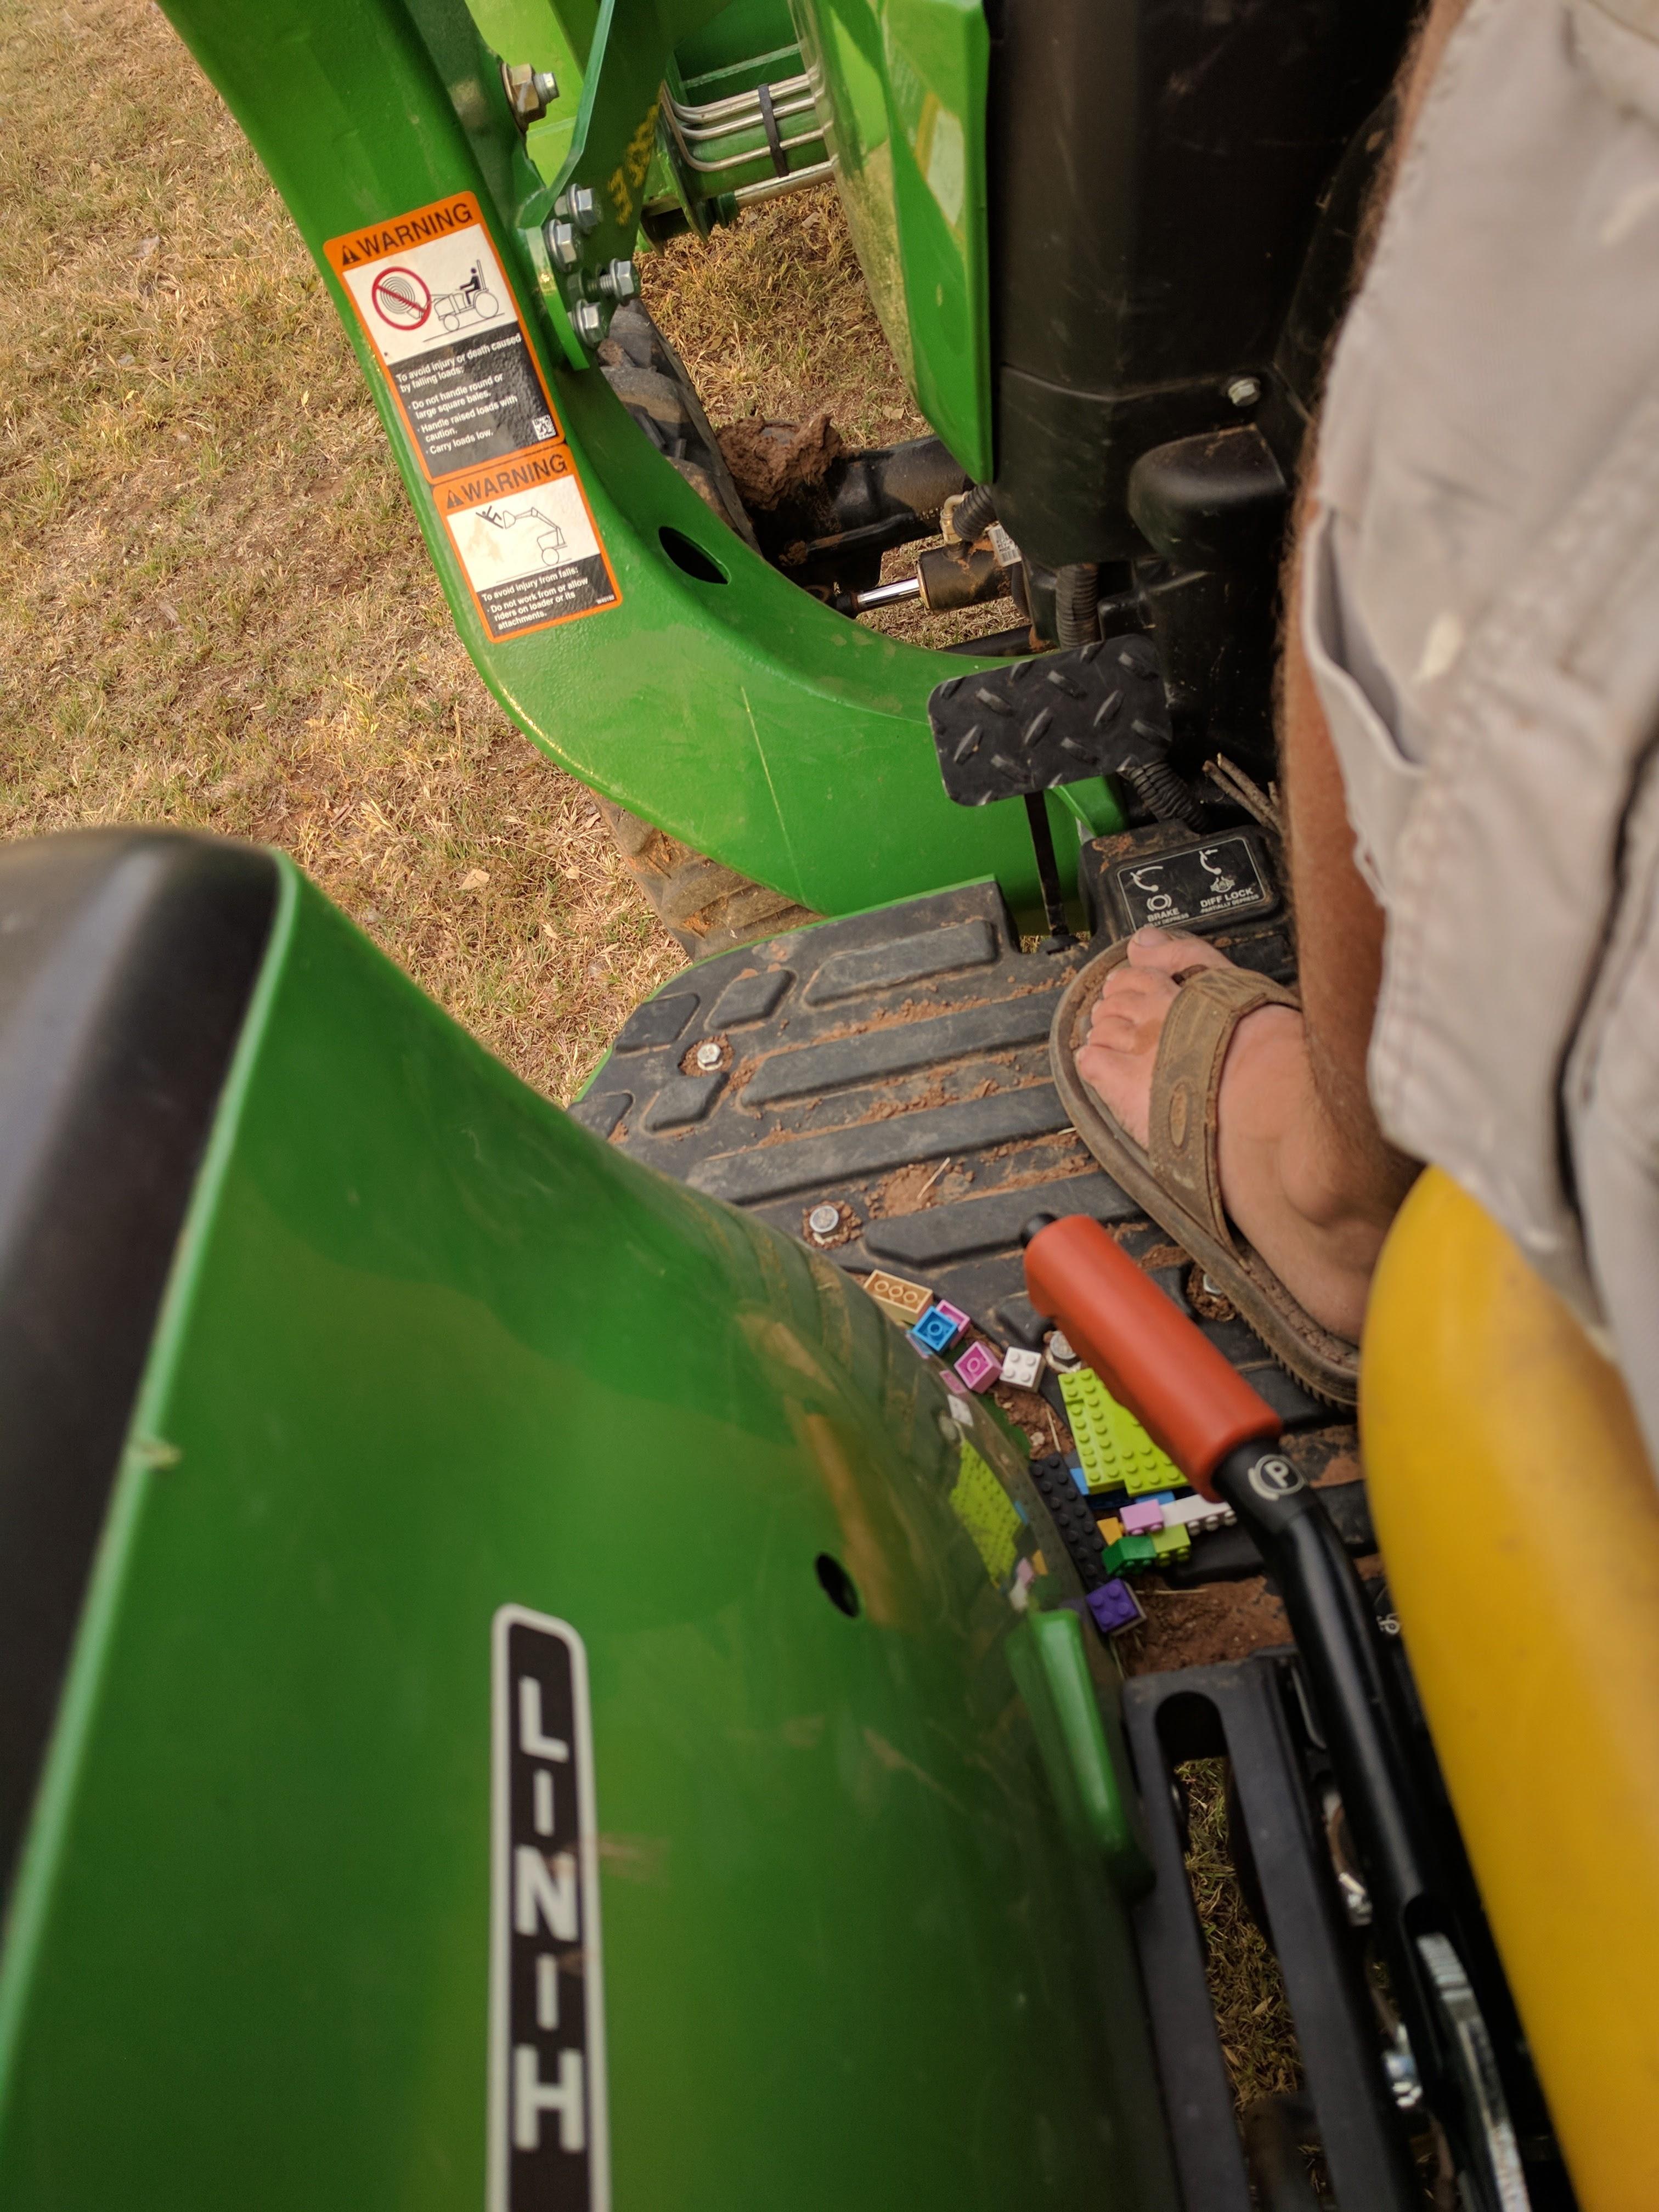 #DadLife on the #Farmlife